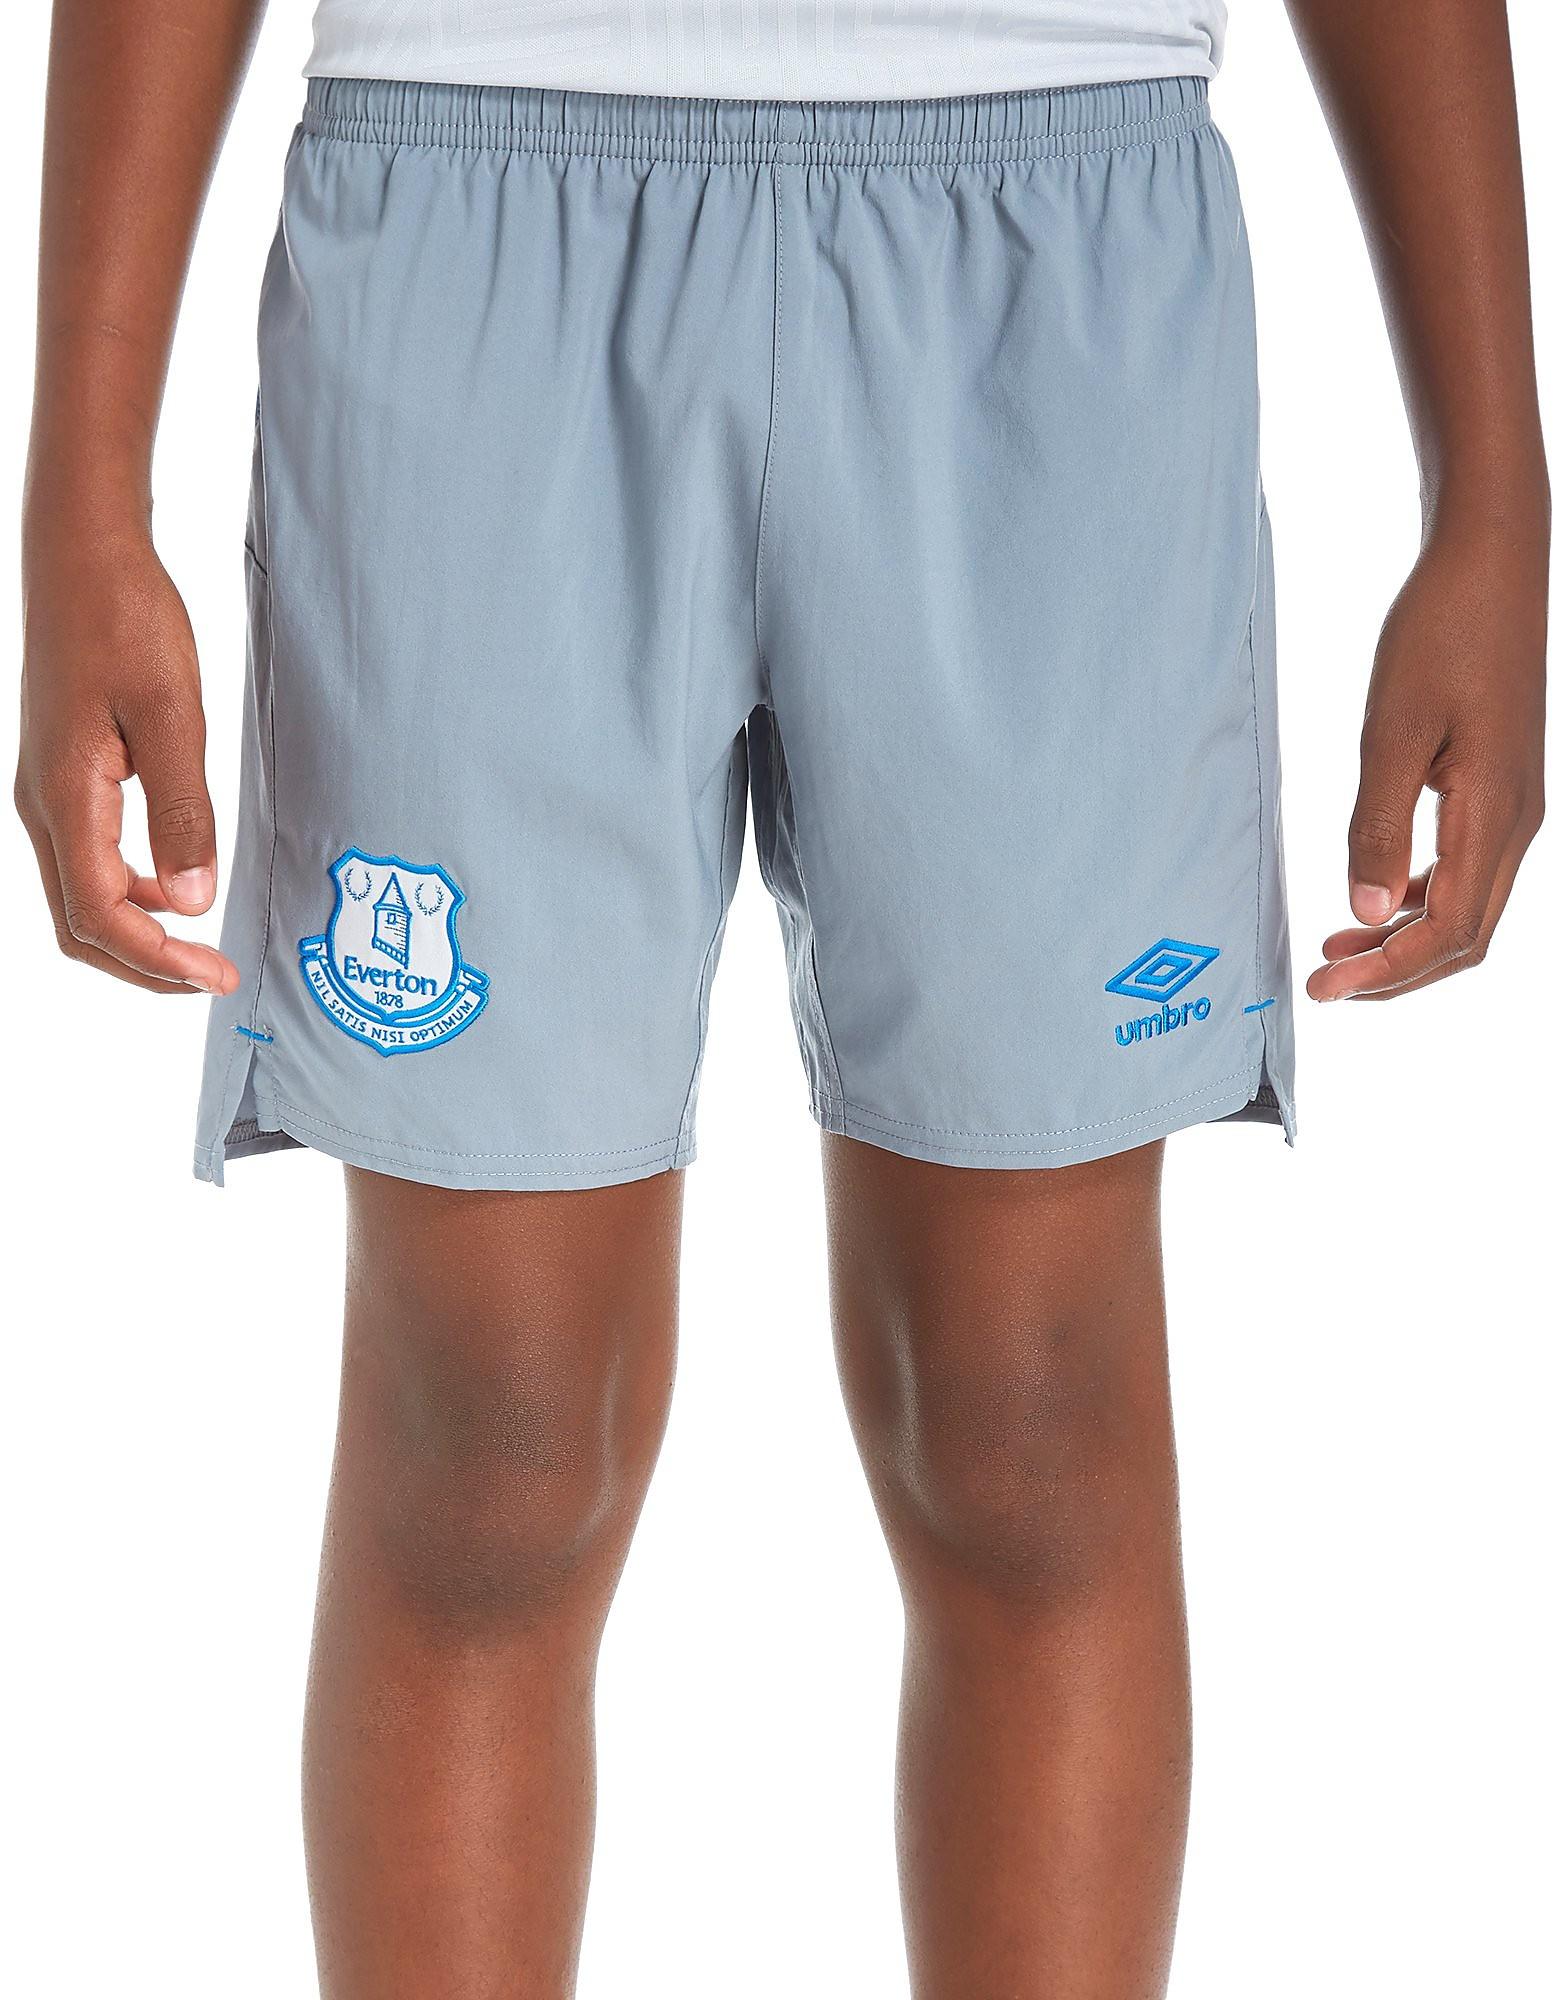 Umbro Everton FC 2017/18 Away Shorts Junior